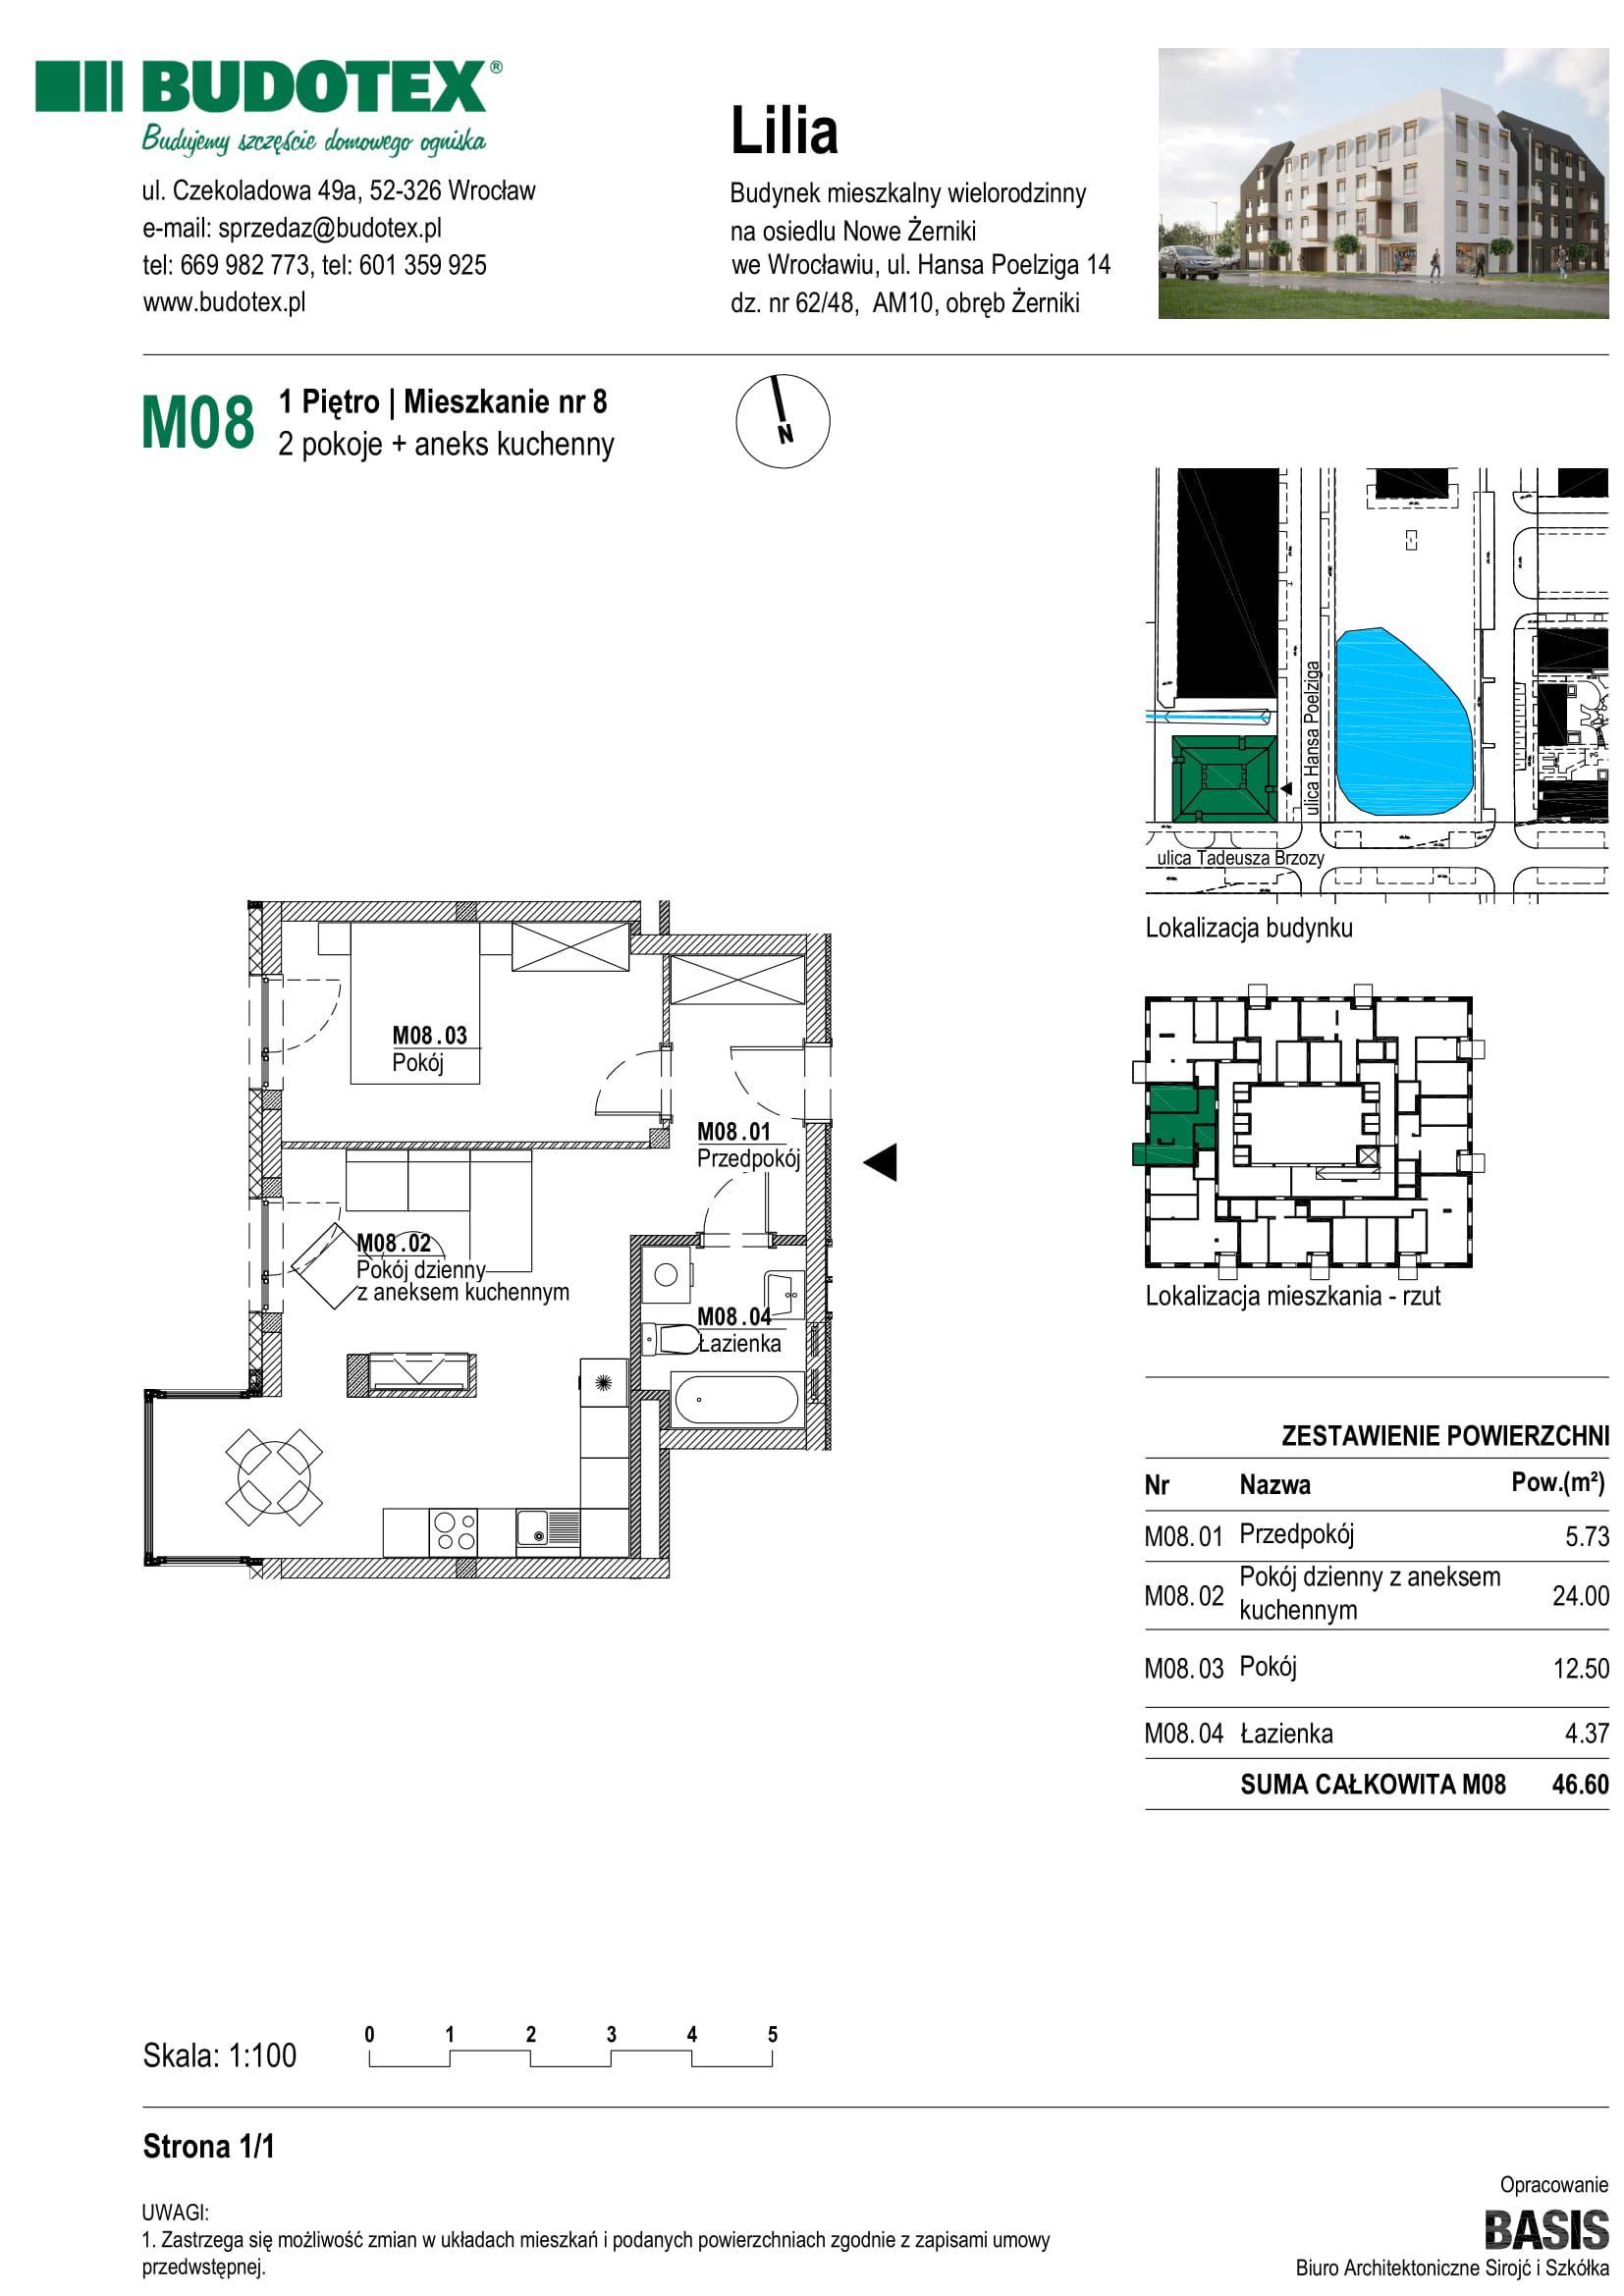 Mieszkanie nr M08